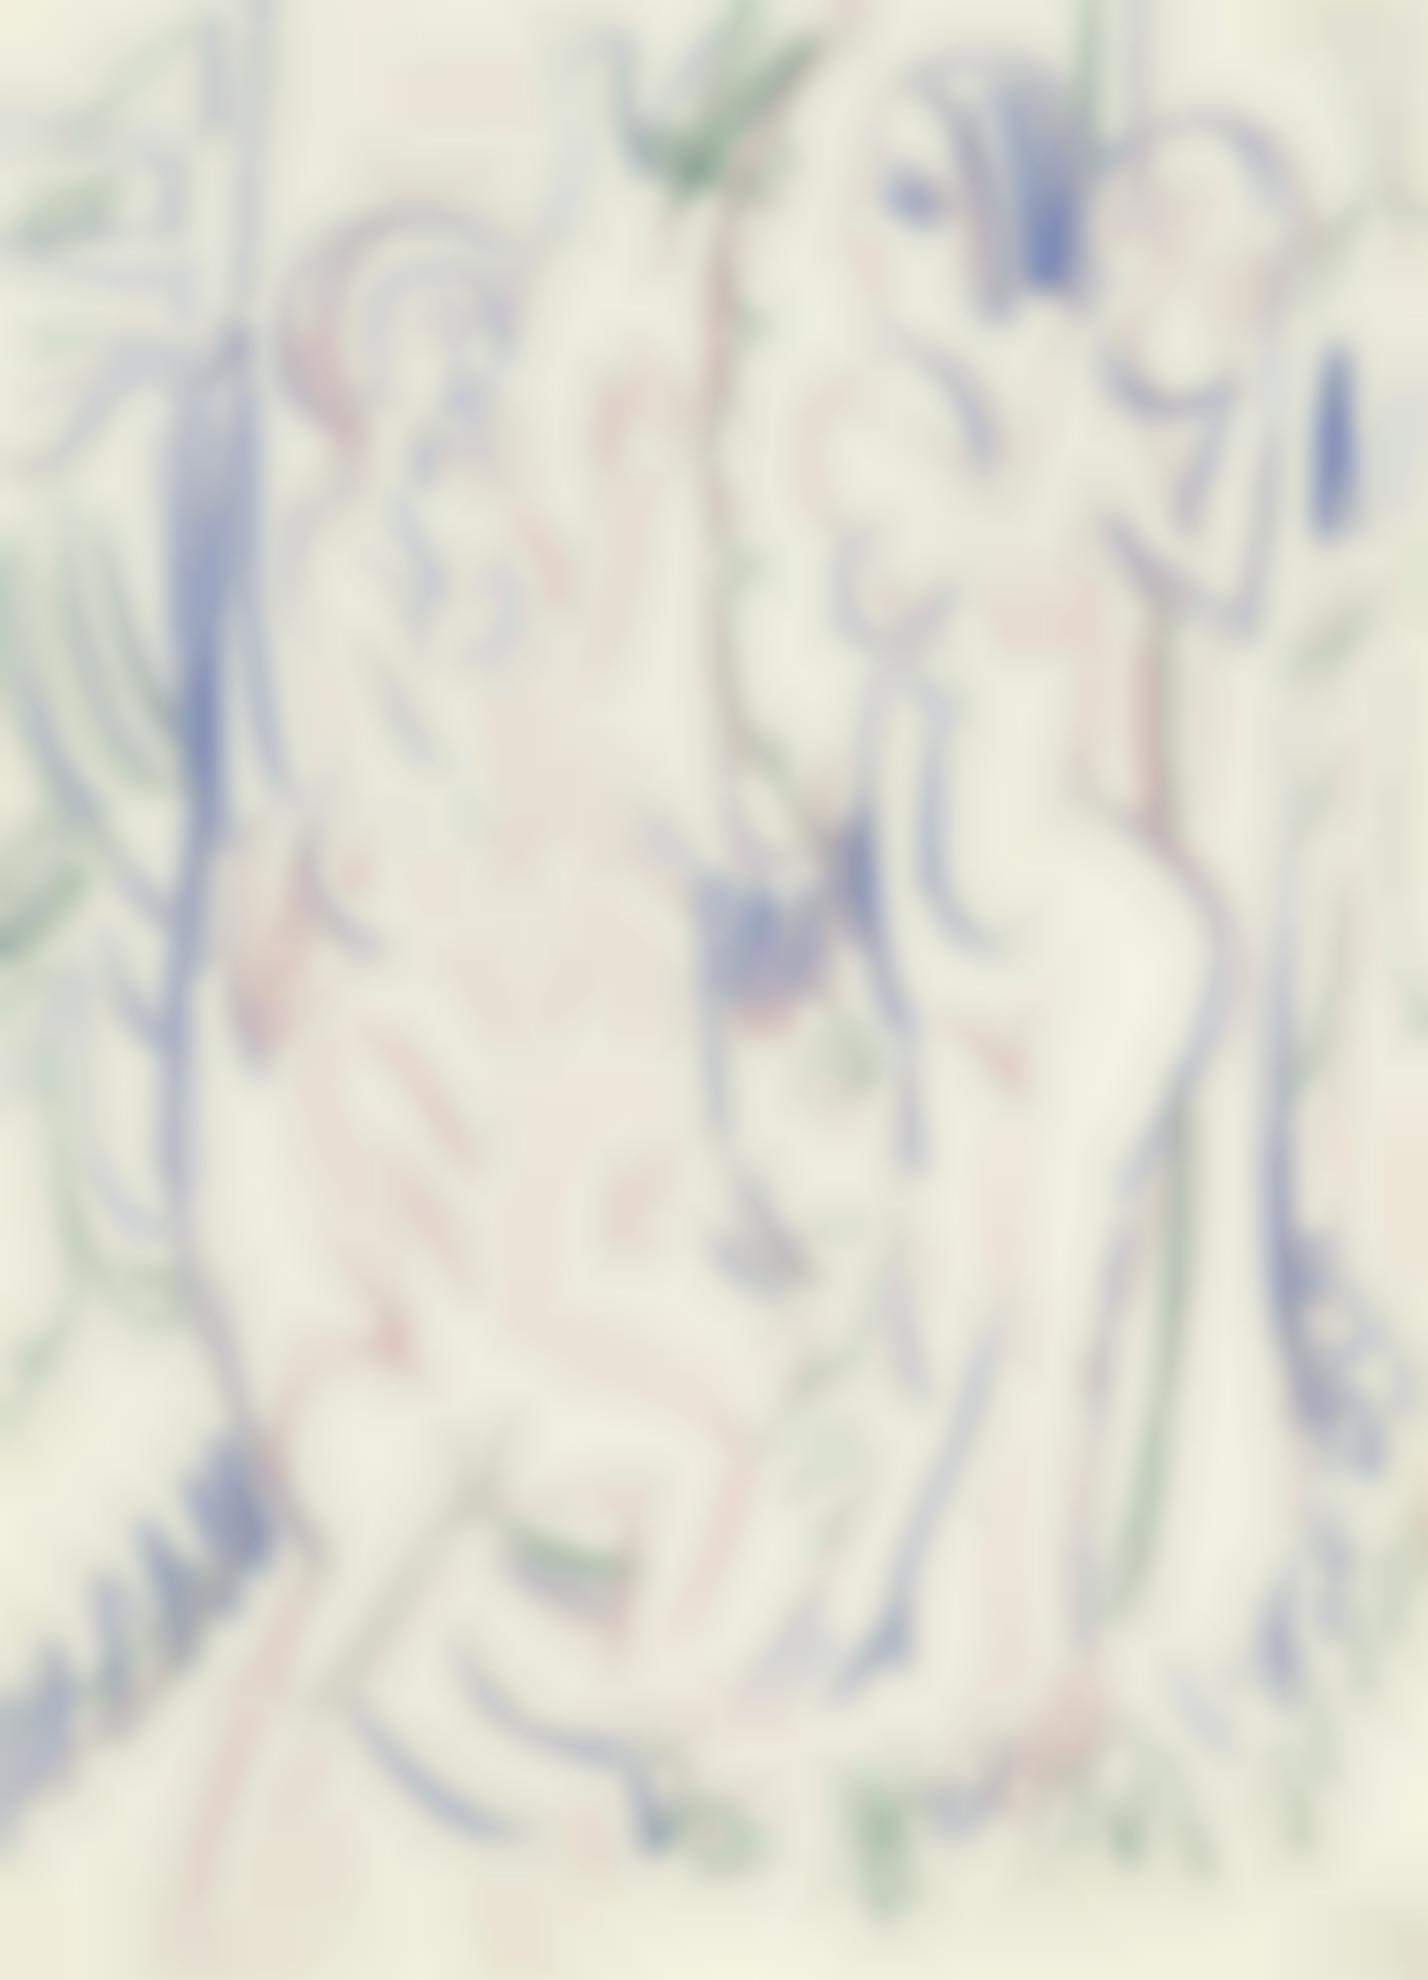 Ernst Ludwig Kirchner-Ballspielende Nackte Frauen Im Wald (Female Nudes Playing Ball In The Woods)-1925